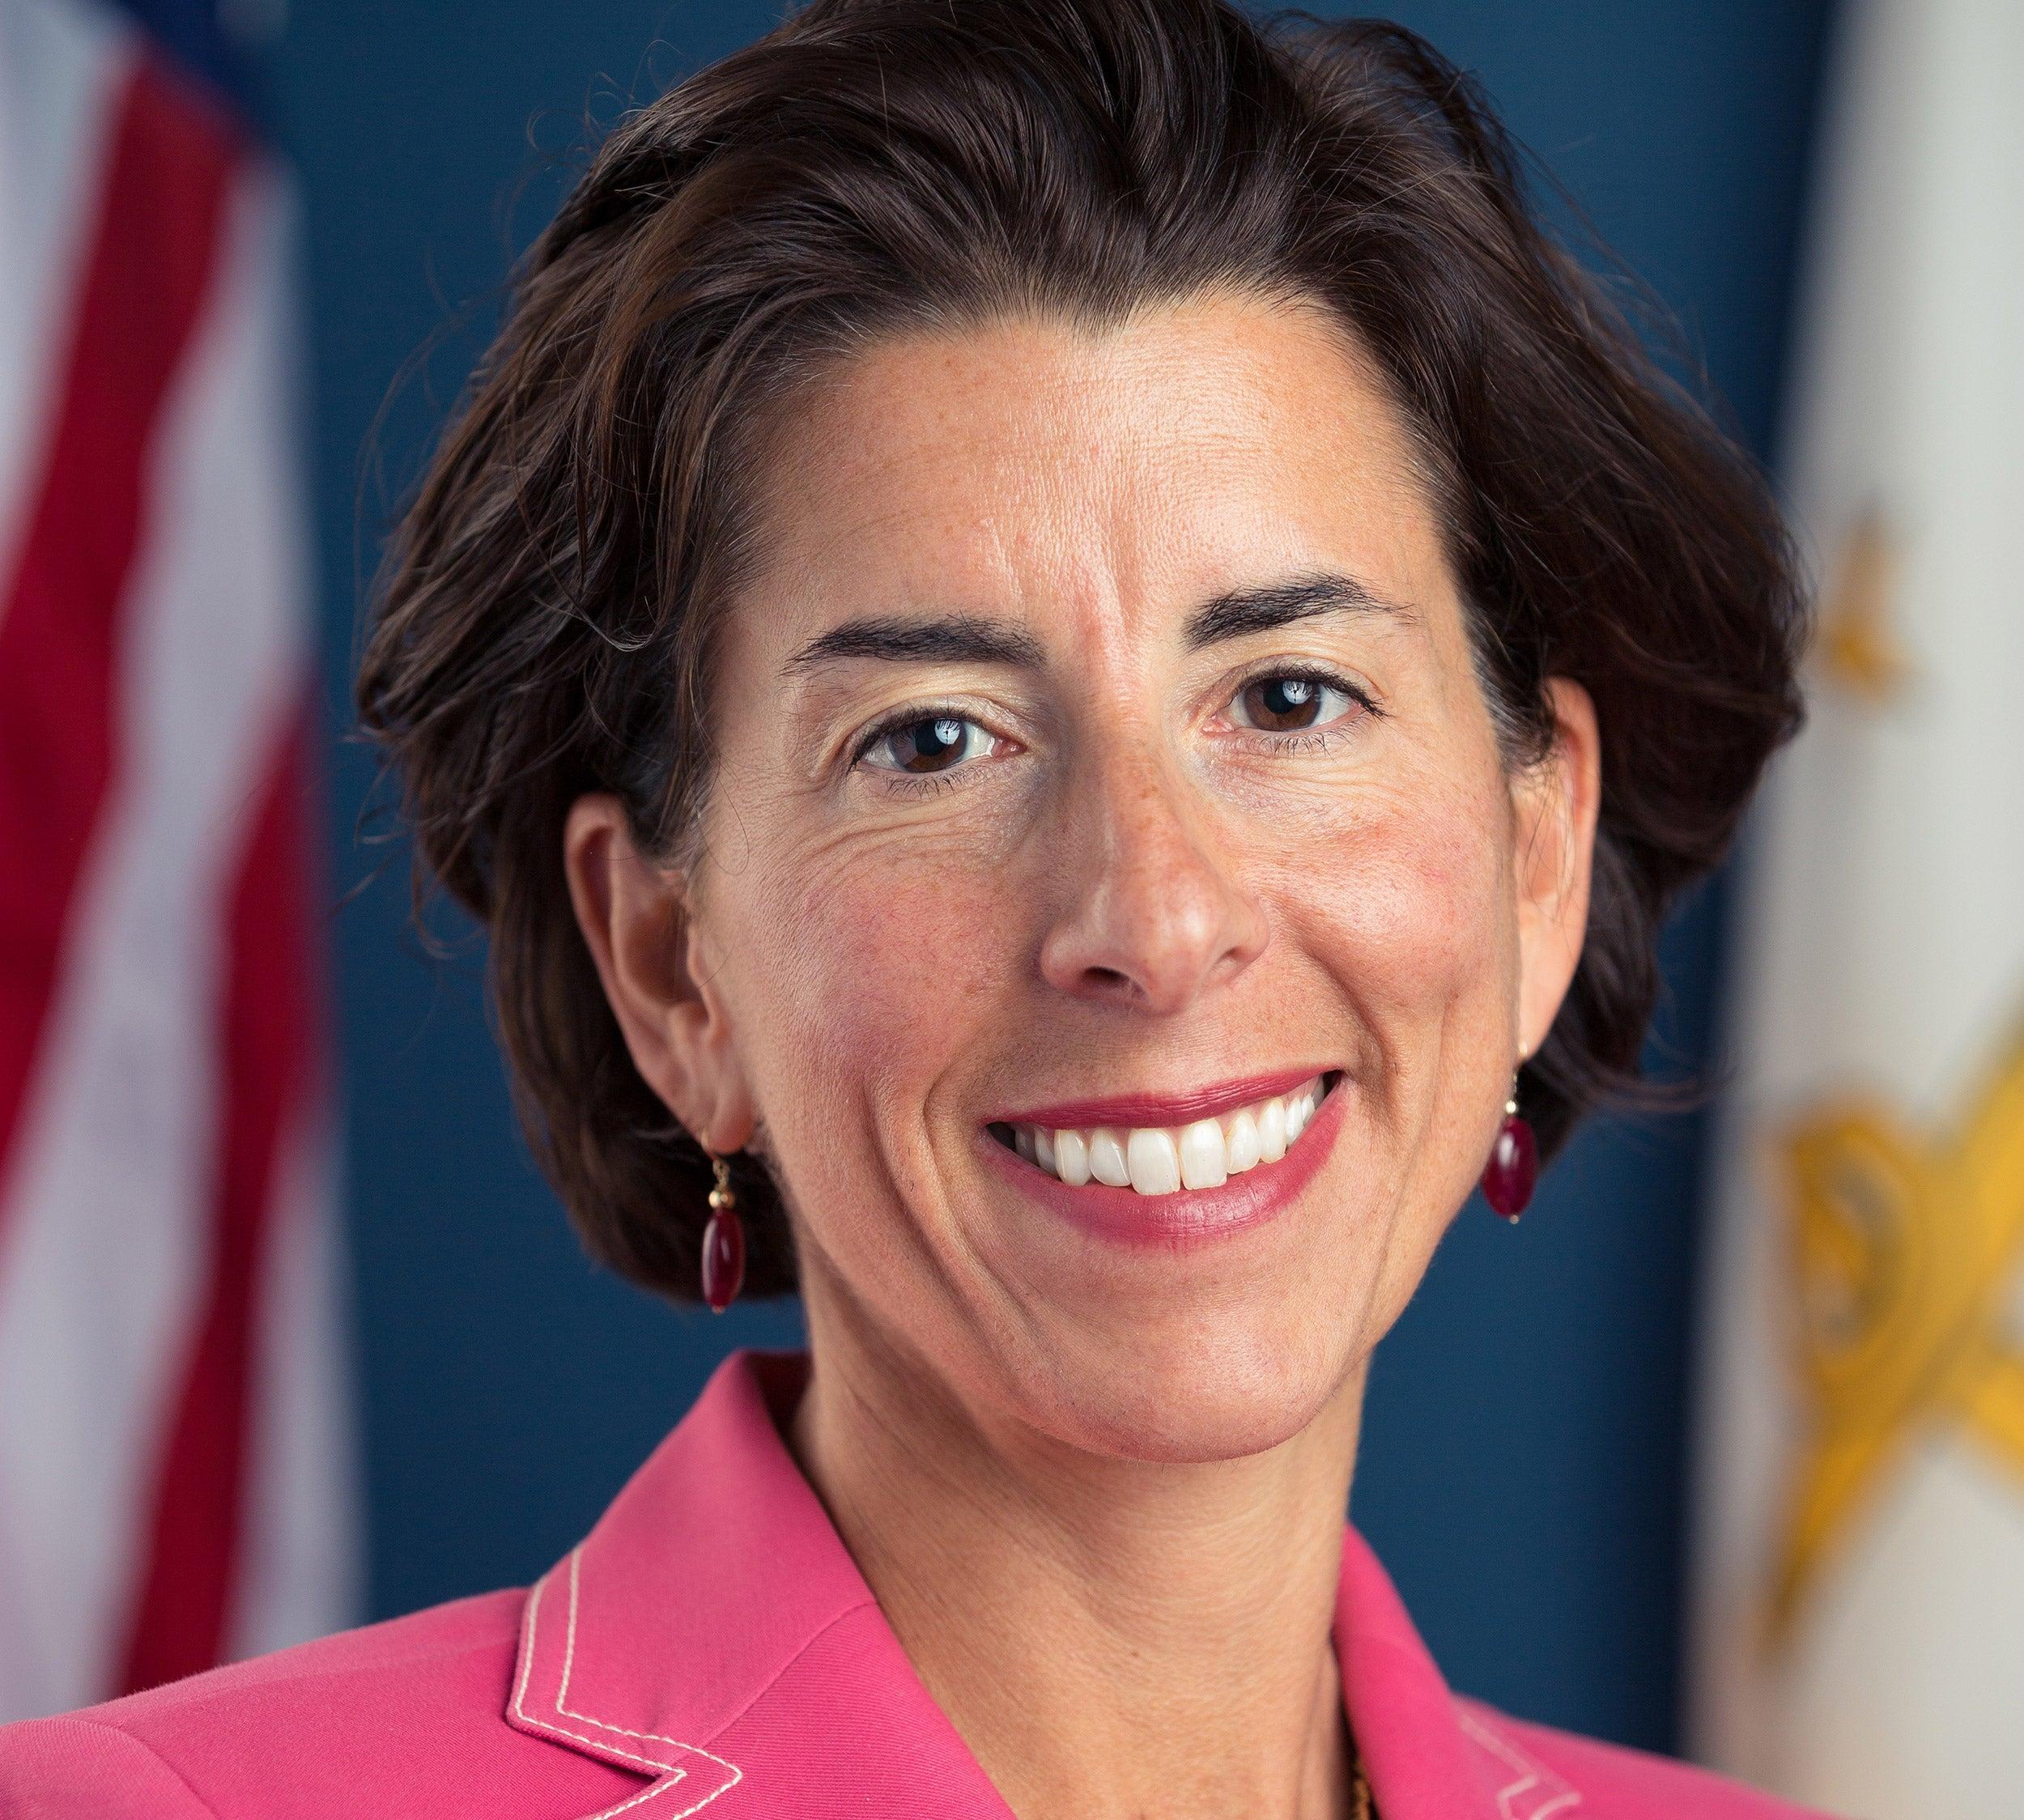 Rhode Island Gov. Gina M. Raimondo